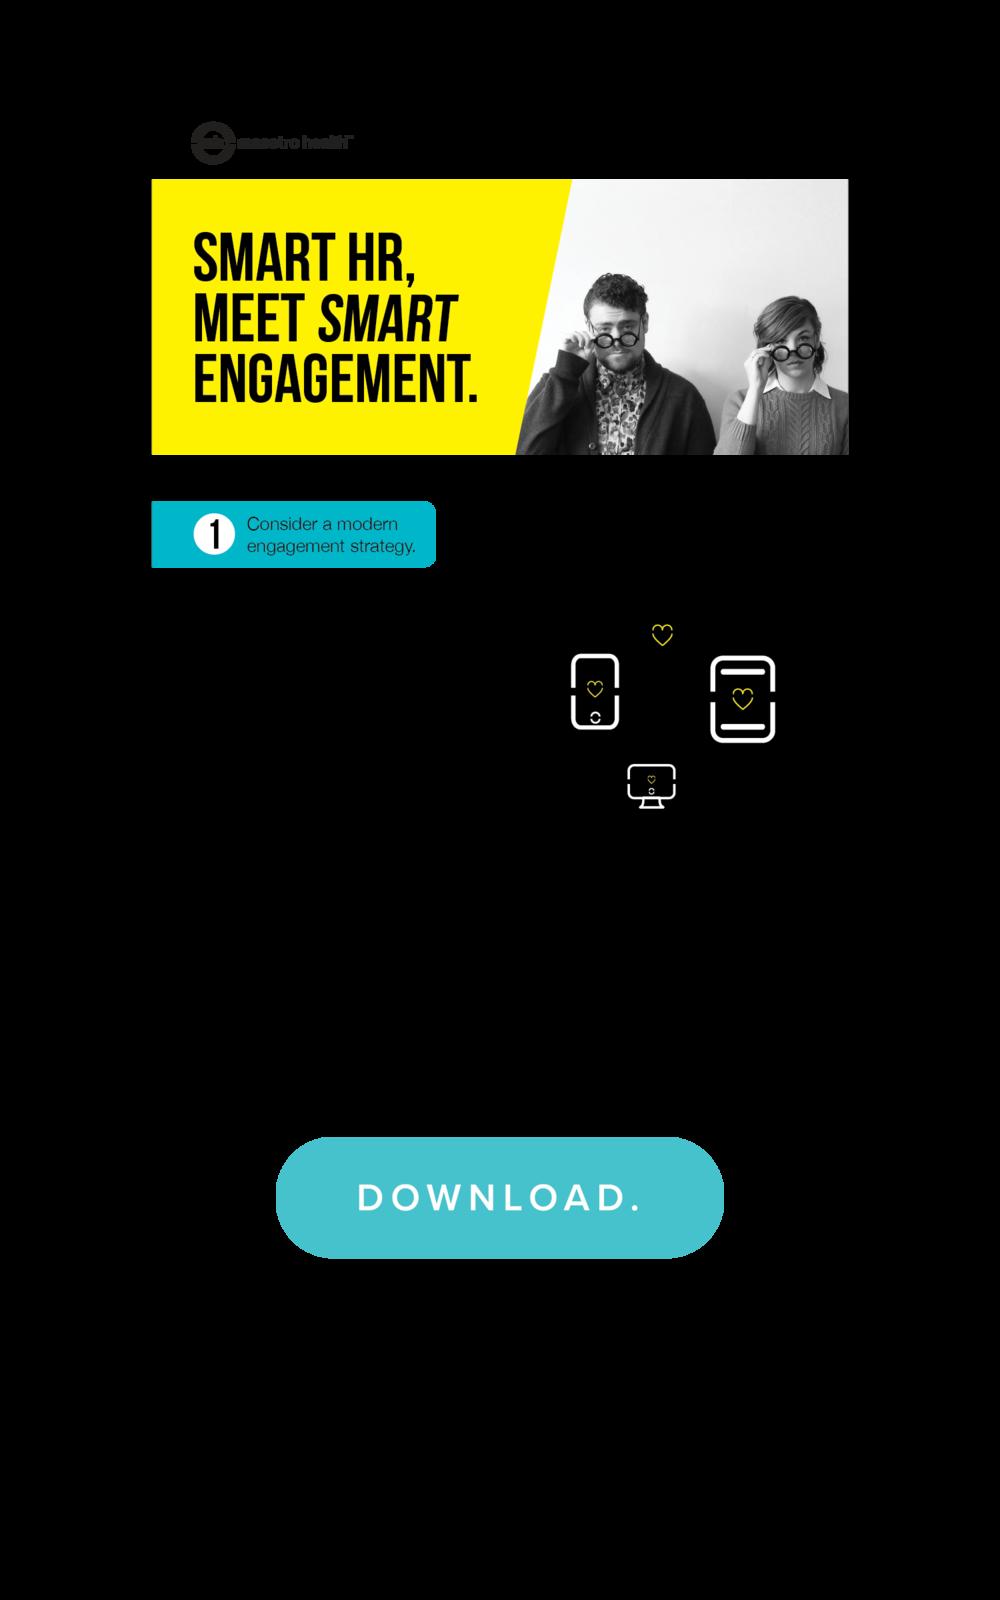 LandingPage_JulyBenAccts_Webinar_Imagery_Infographics_082217_r94.png